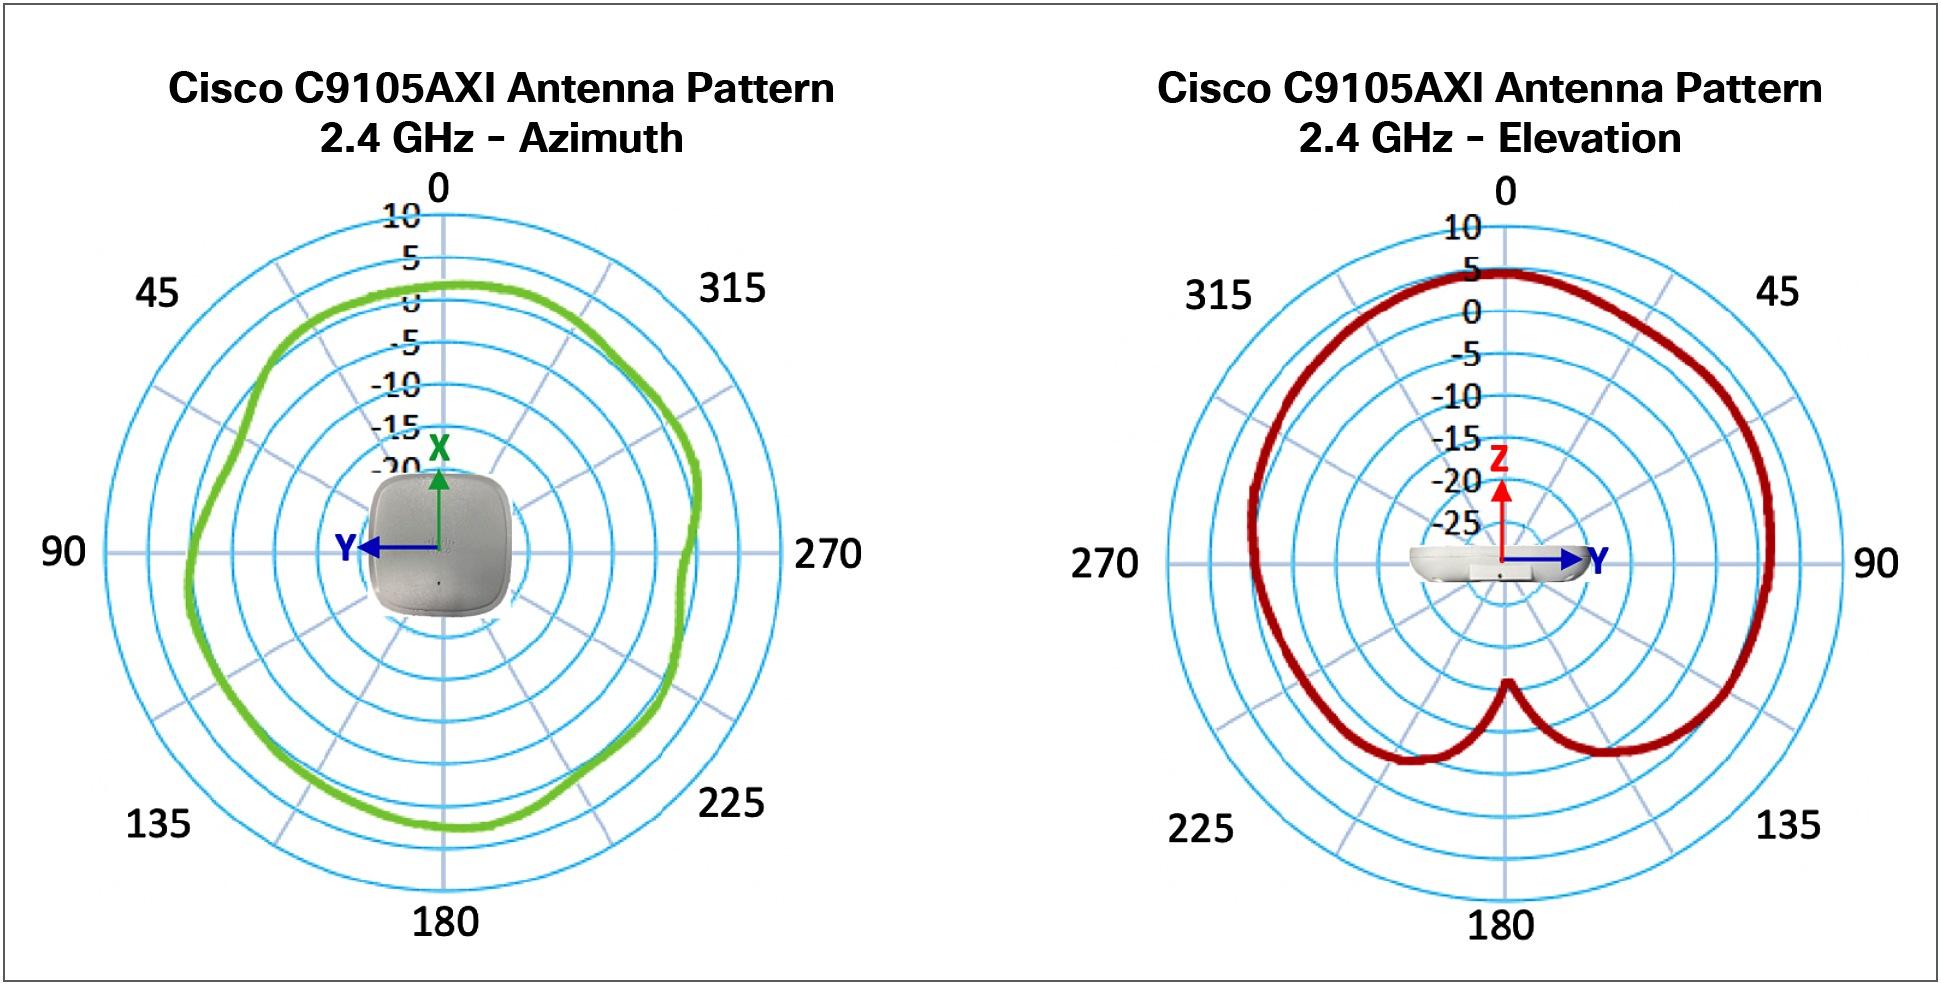 Cisco C9105AXI Antenna Pattern_2.4 GHz (Azimuth & Elevation)